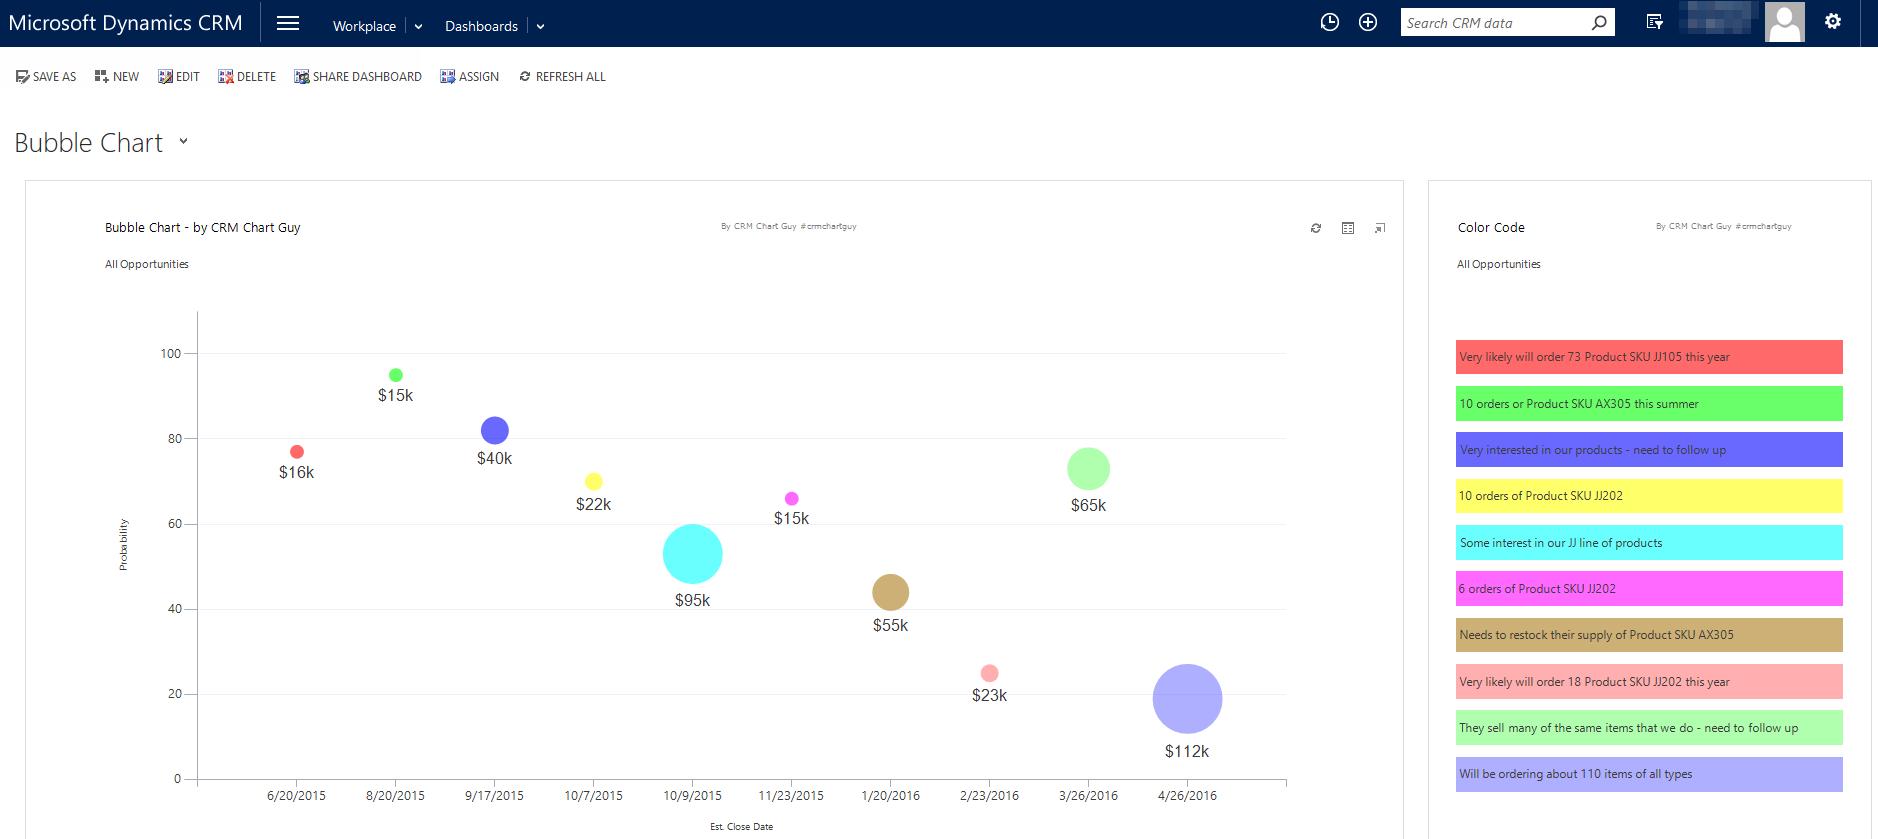 Bubble Charts in Dynamics CRM – Bubble Chart